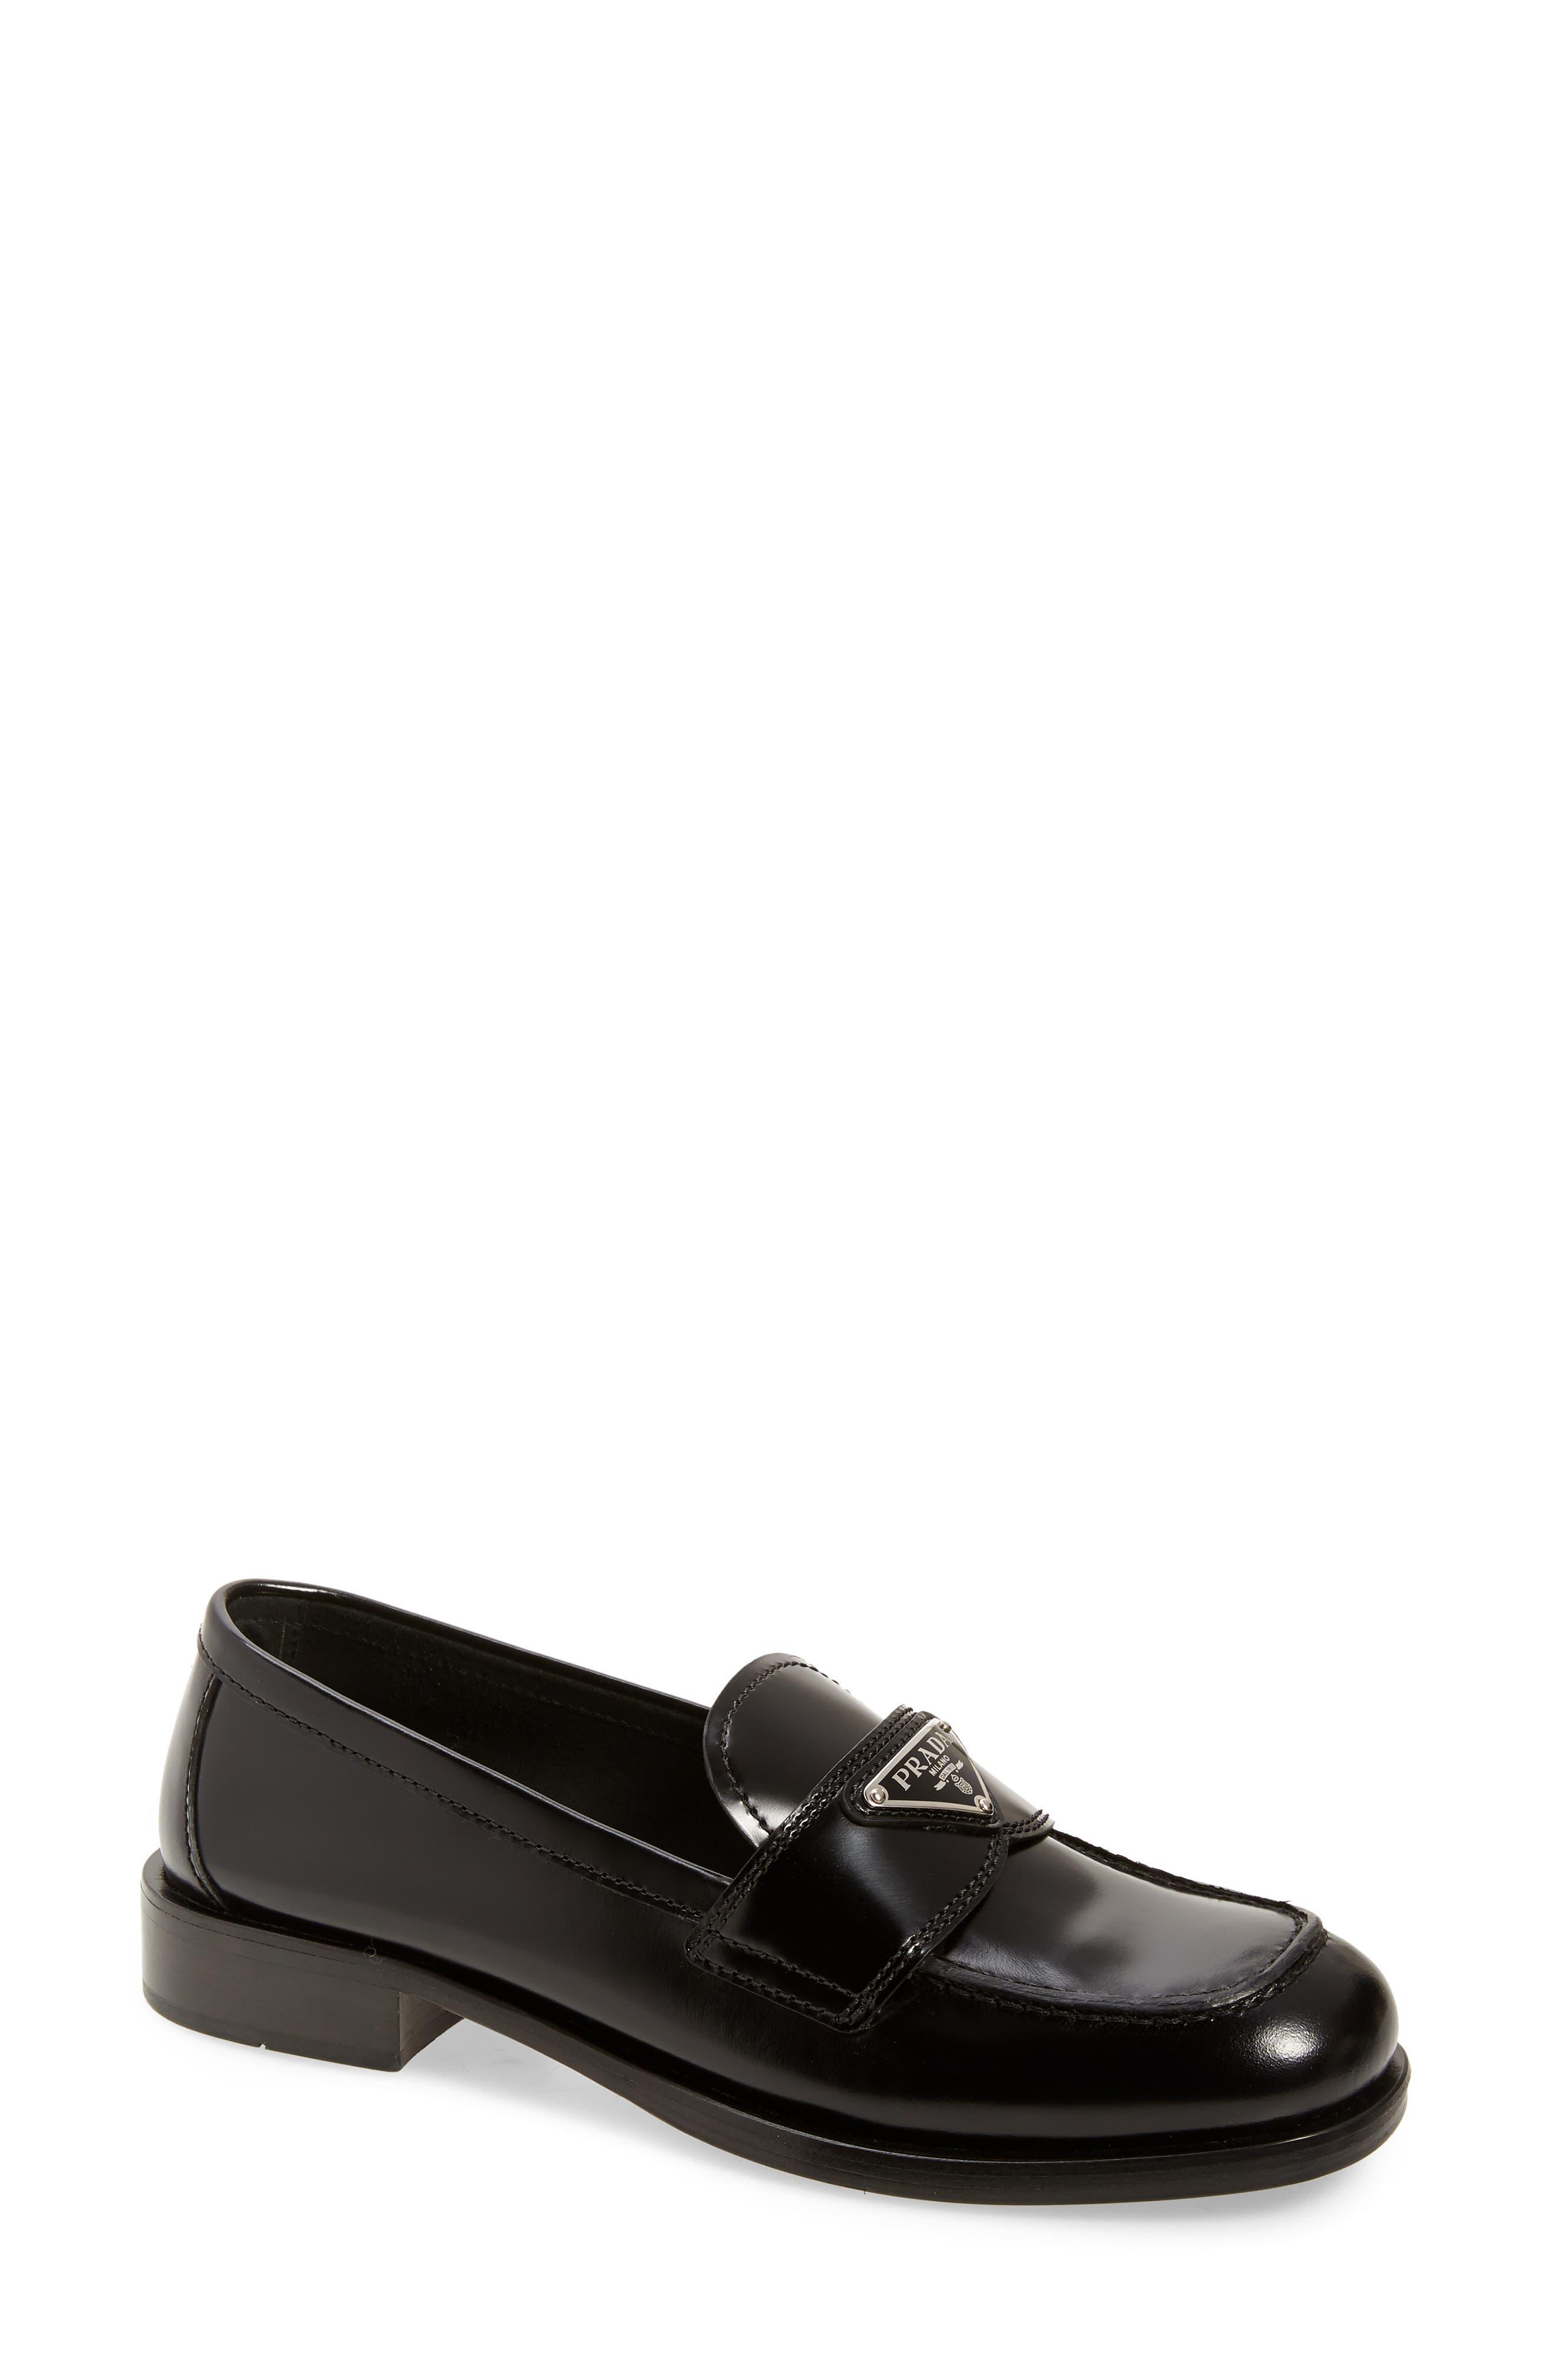 Women's Prada Shoes | Nordstrom